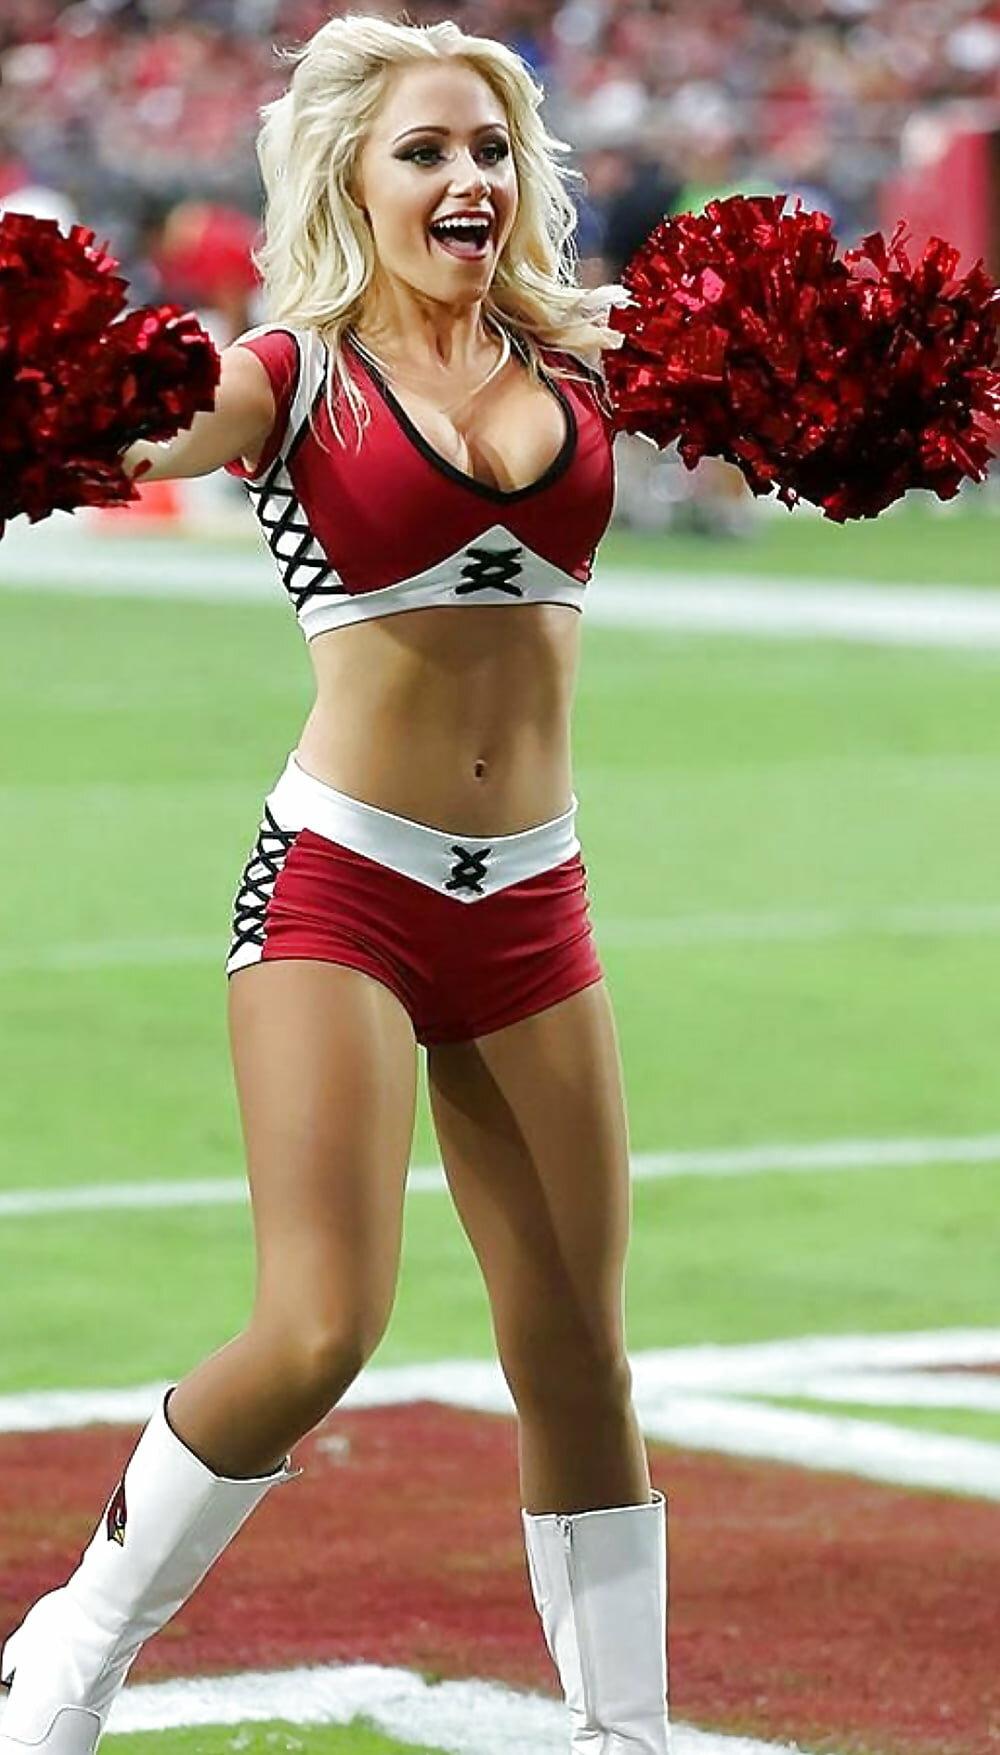 Sex nfl cheerleader pantyhose nude cowgirls